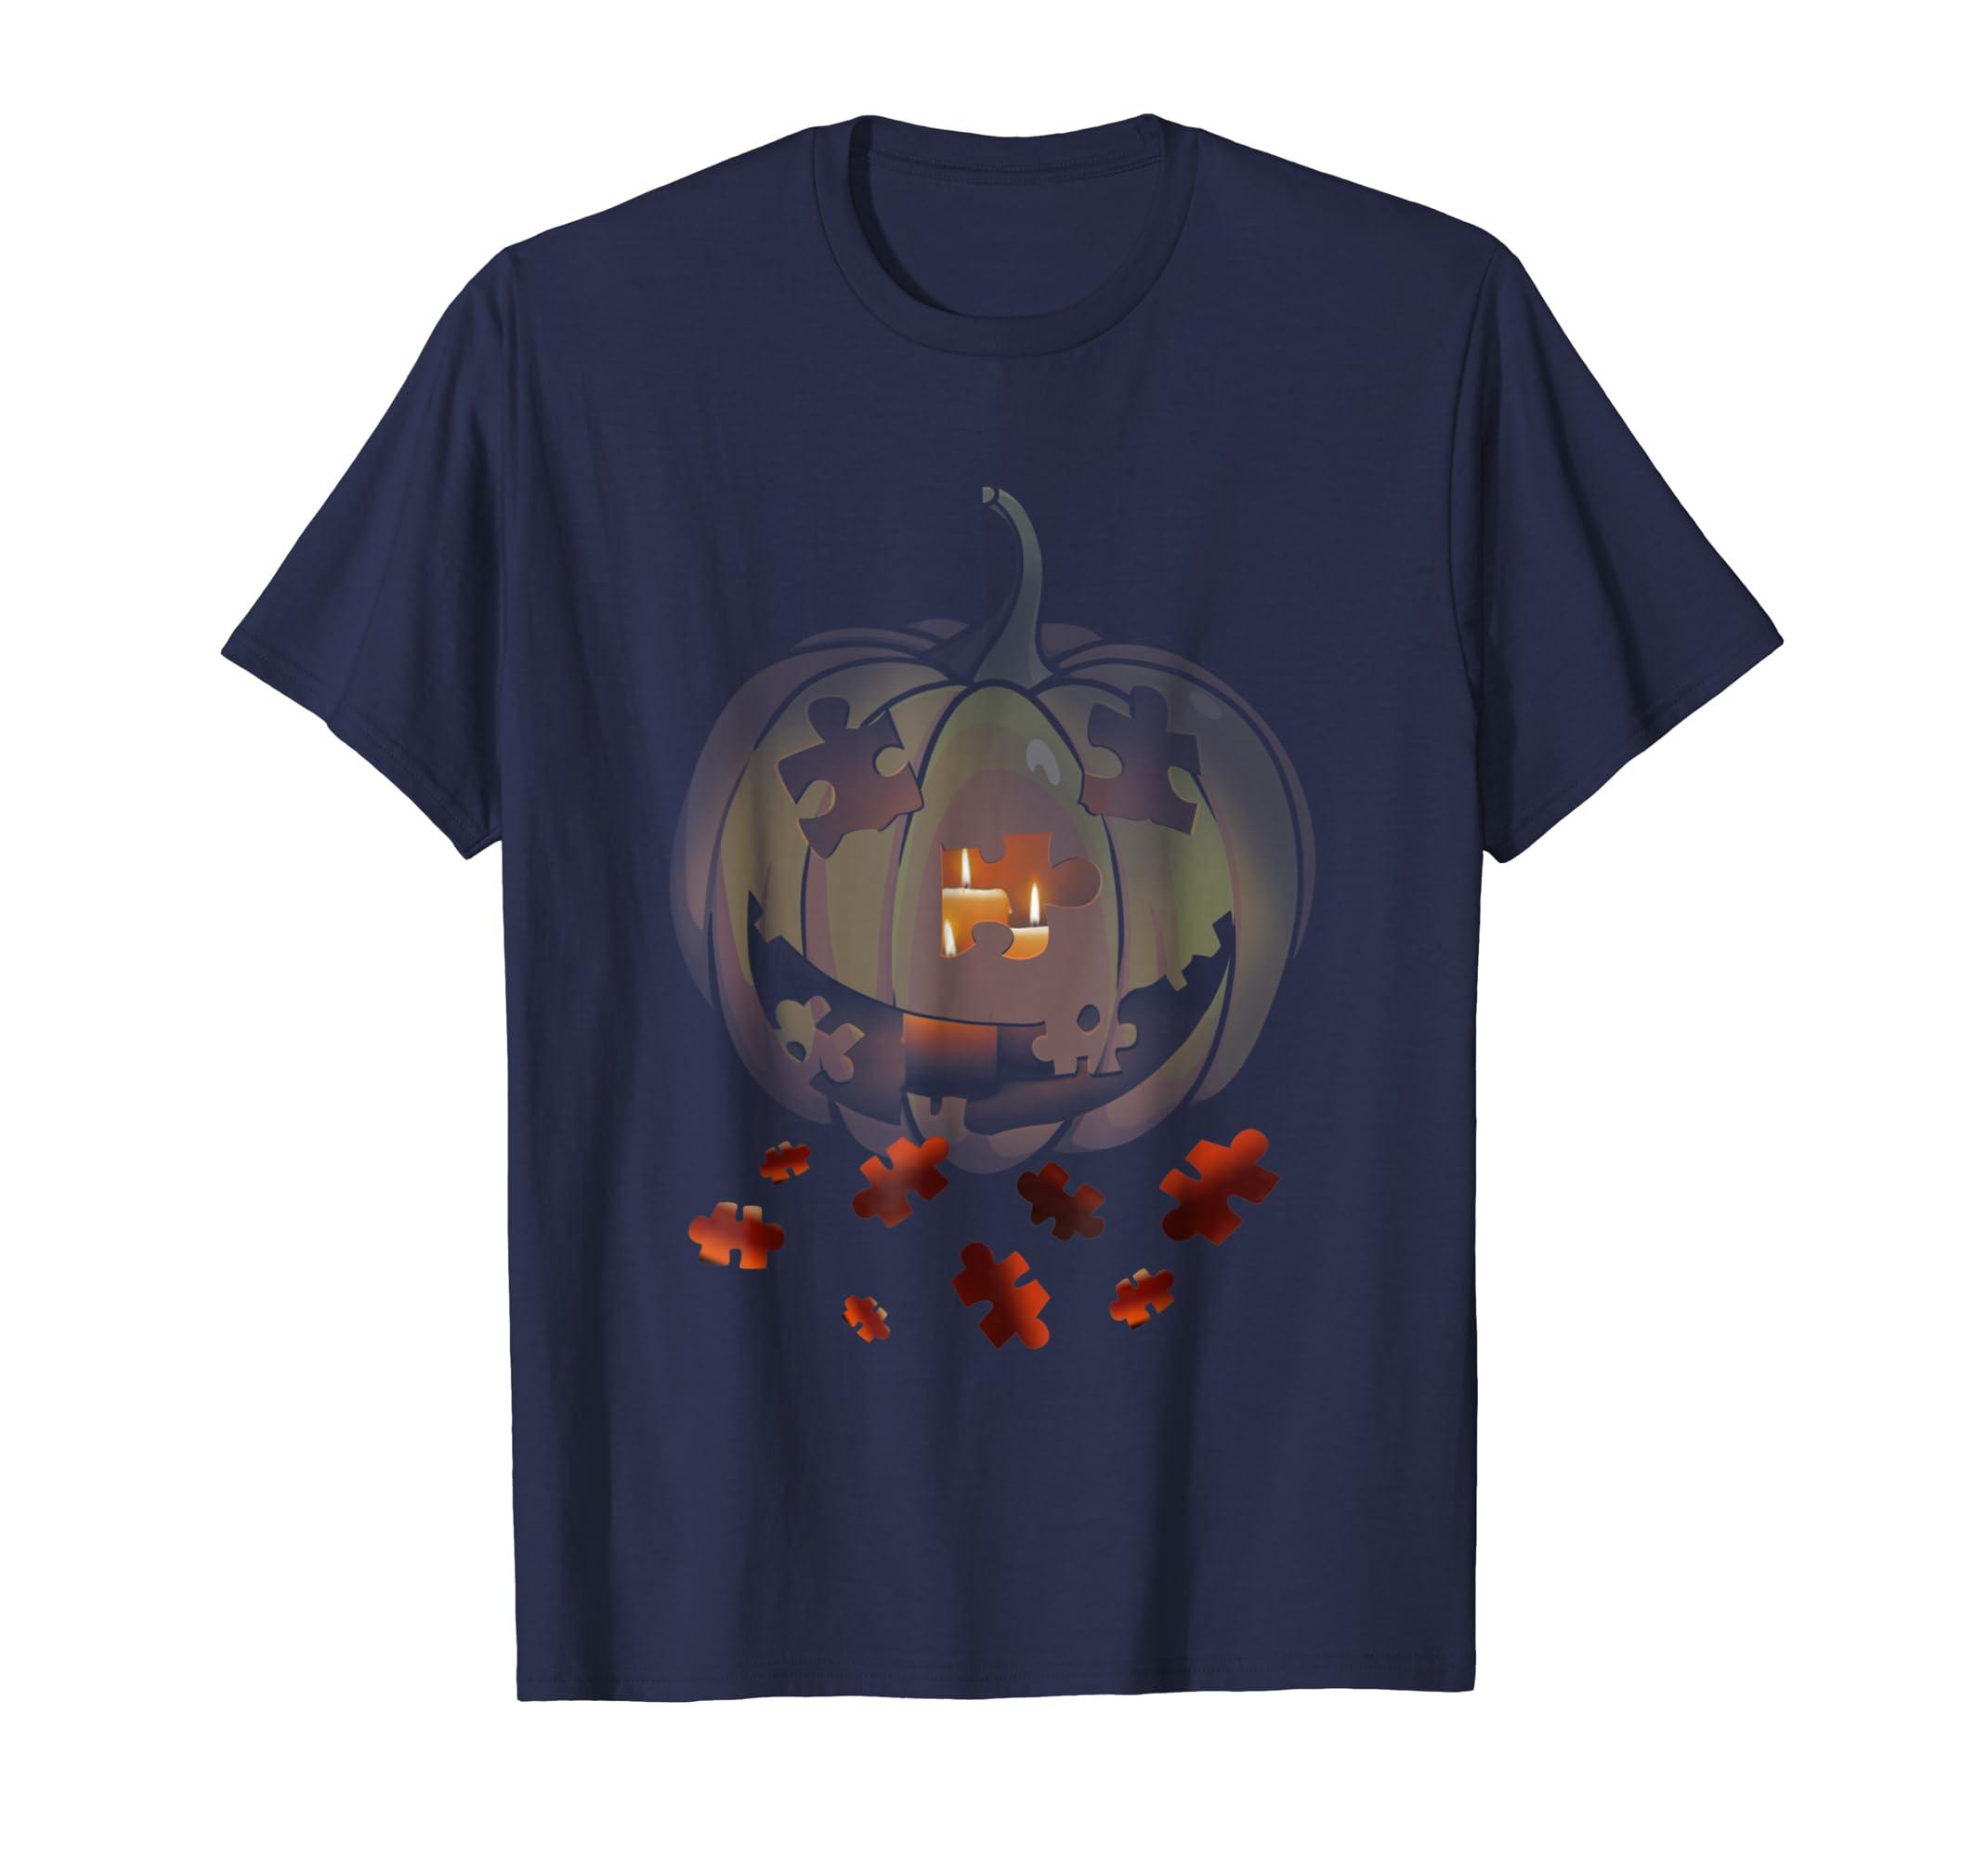 Halloween Autism Funny Pumpkin T Shirt For Men Women-Teesml